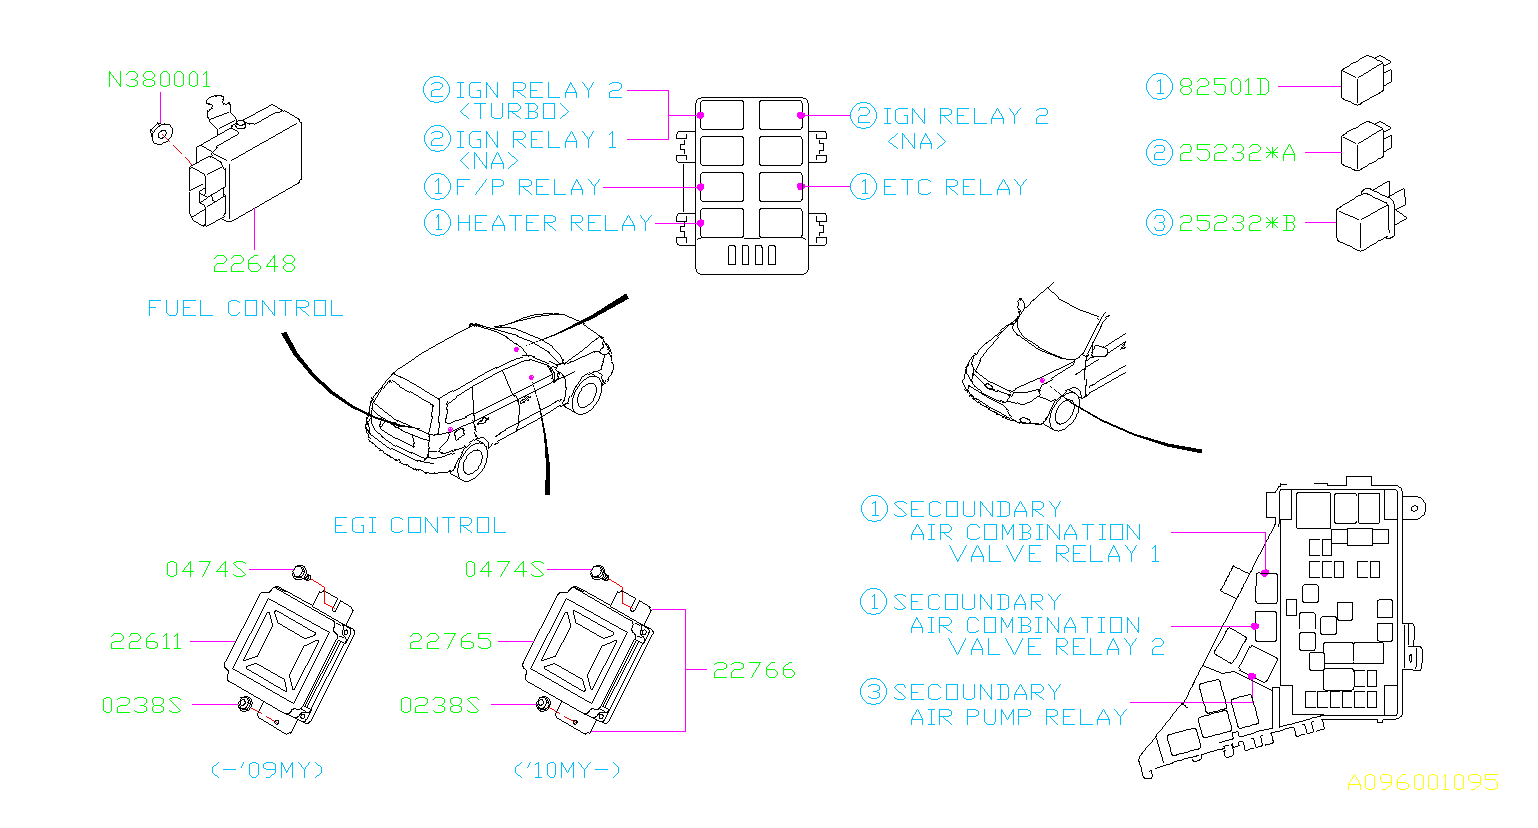 Subaru Forester Engine Control Module